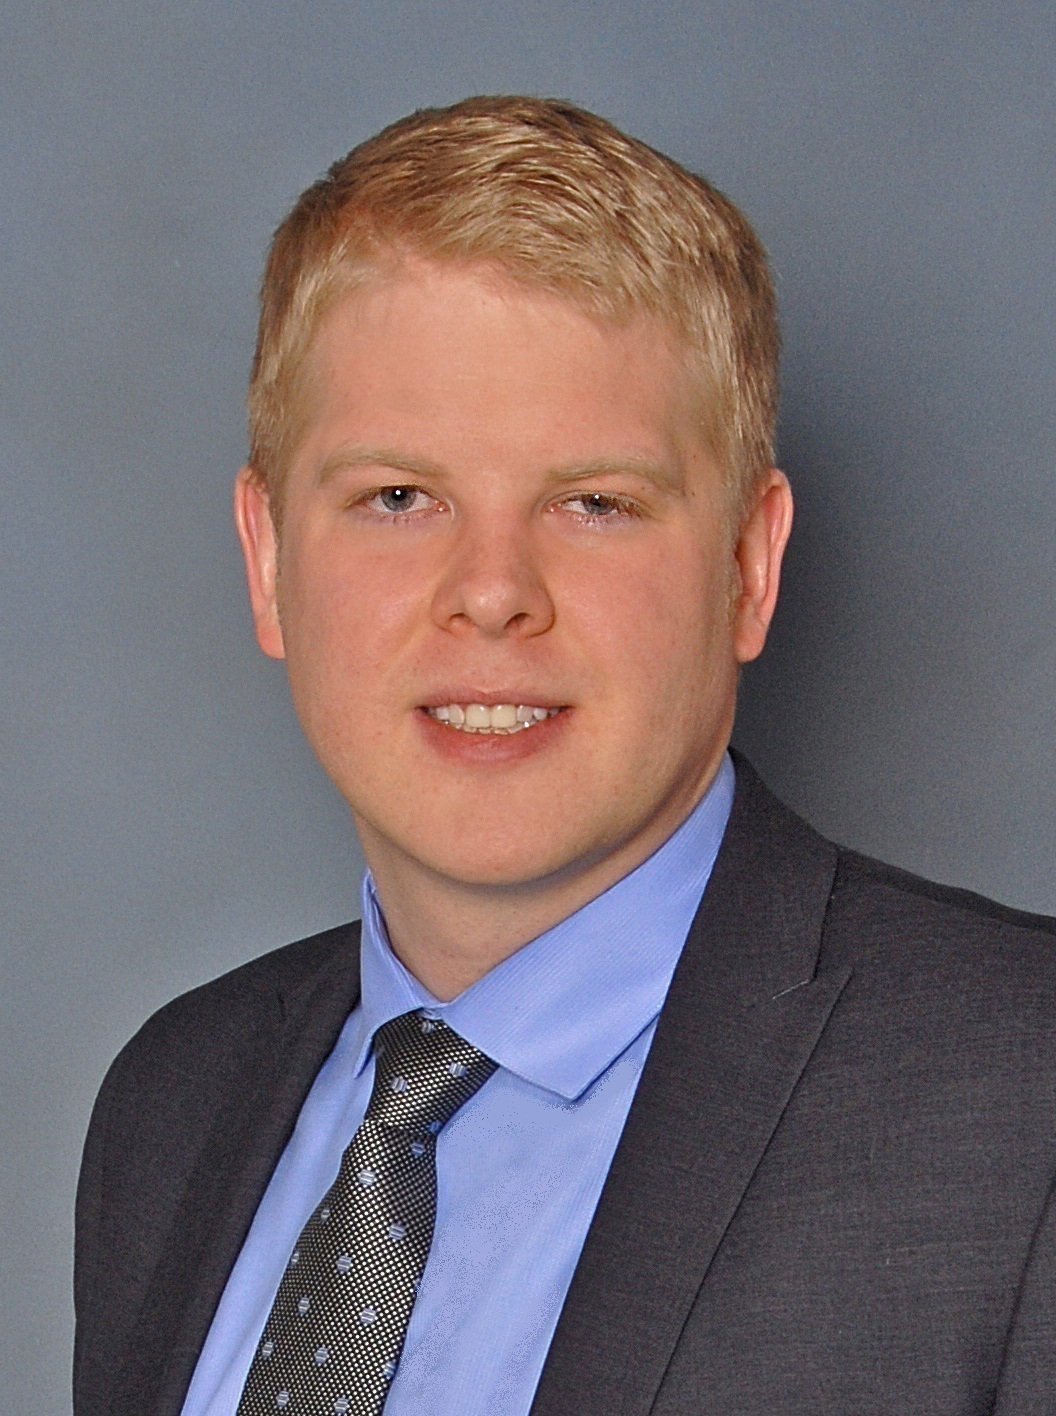 Josh Schaefer